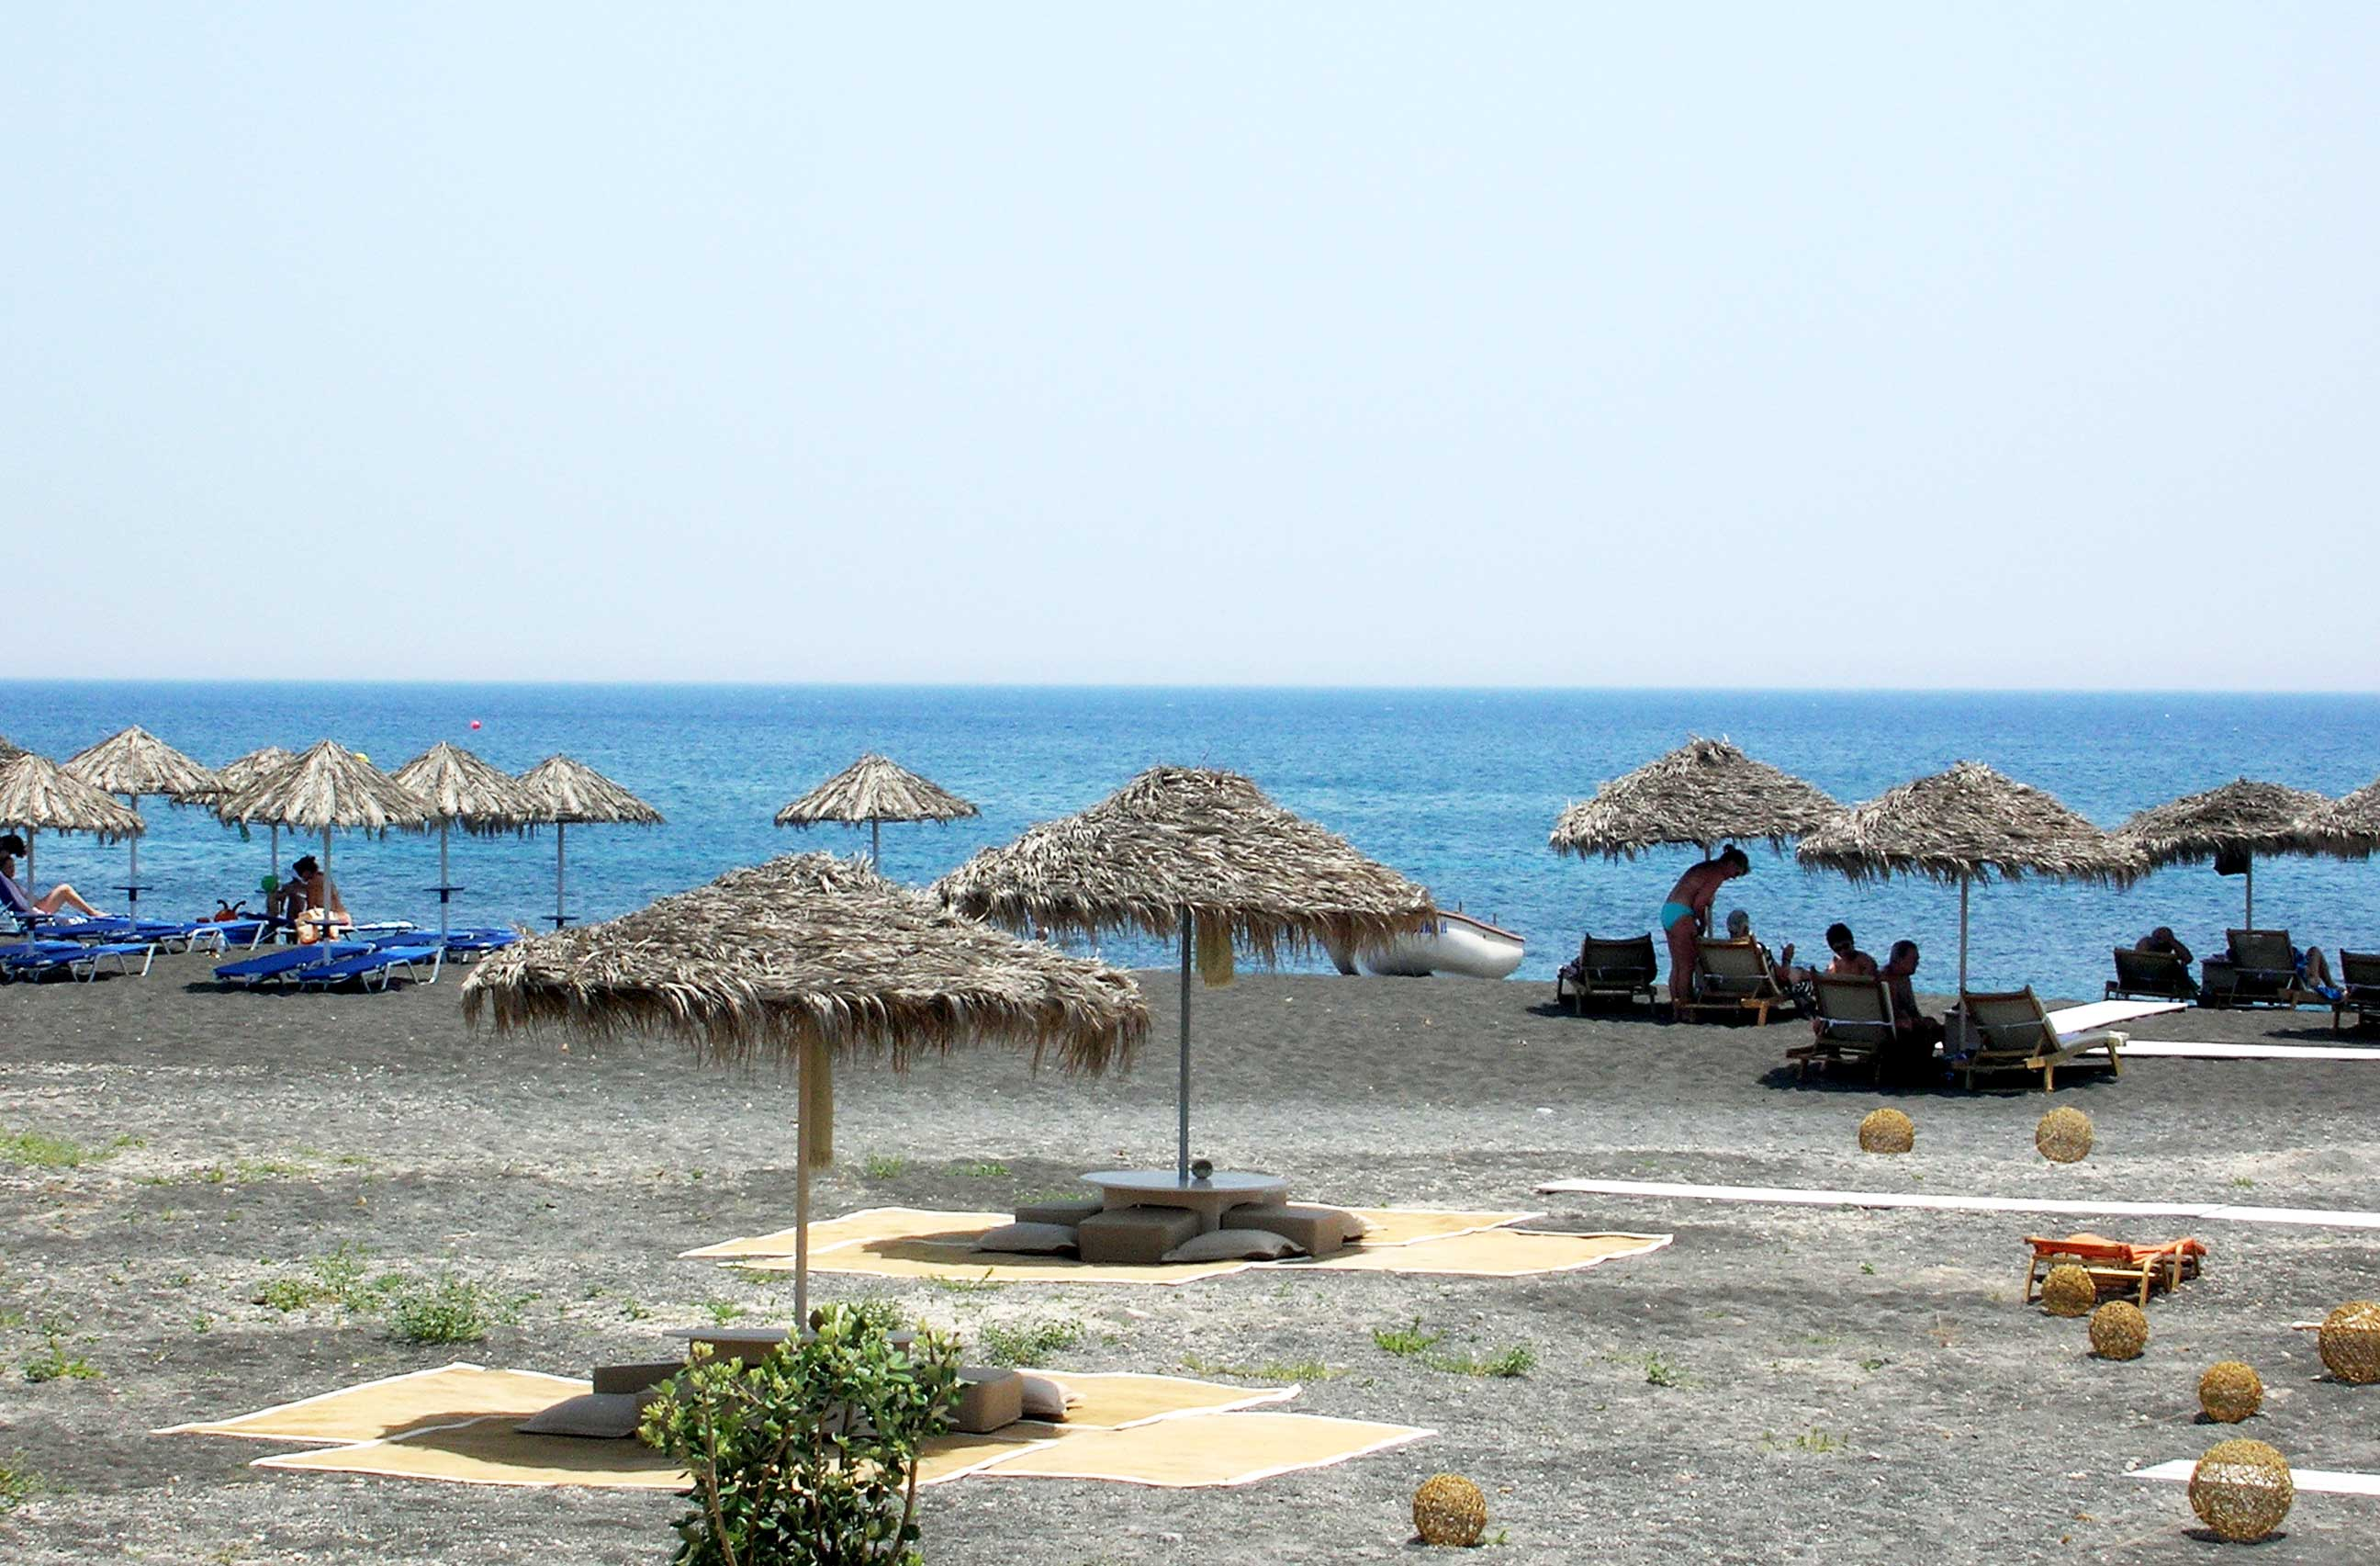 Santorin plaža, grčka ostrva